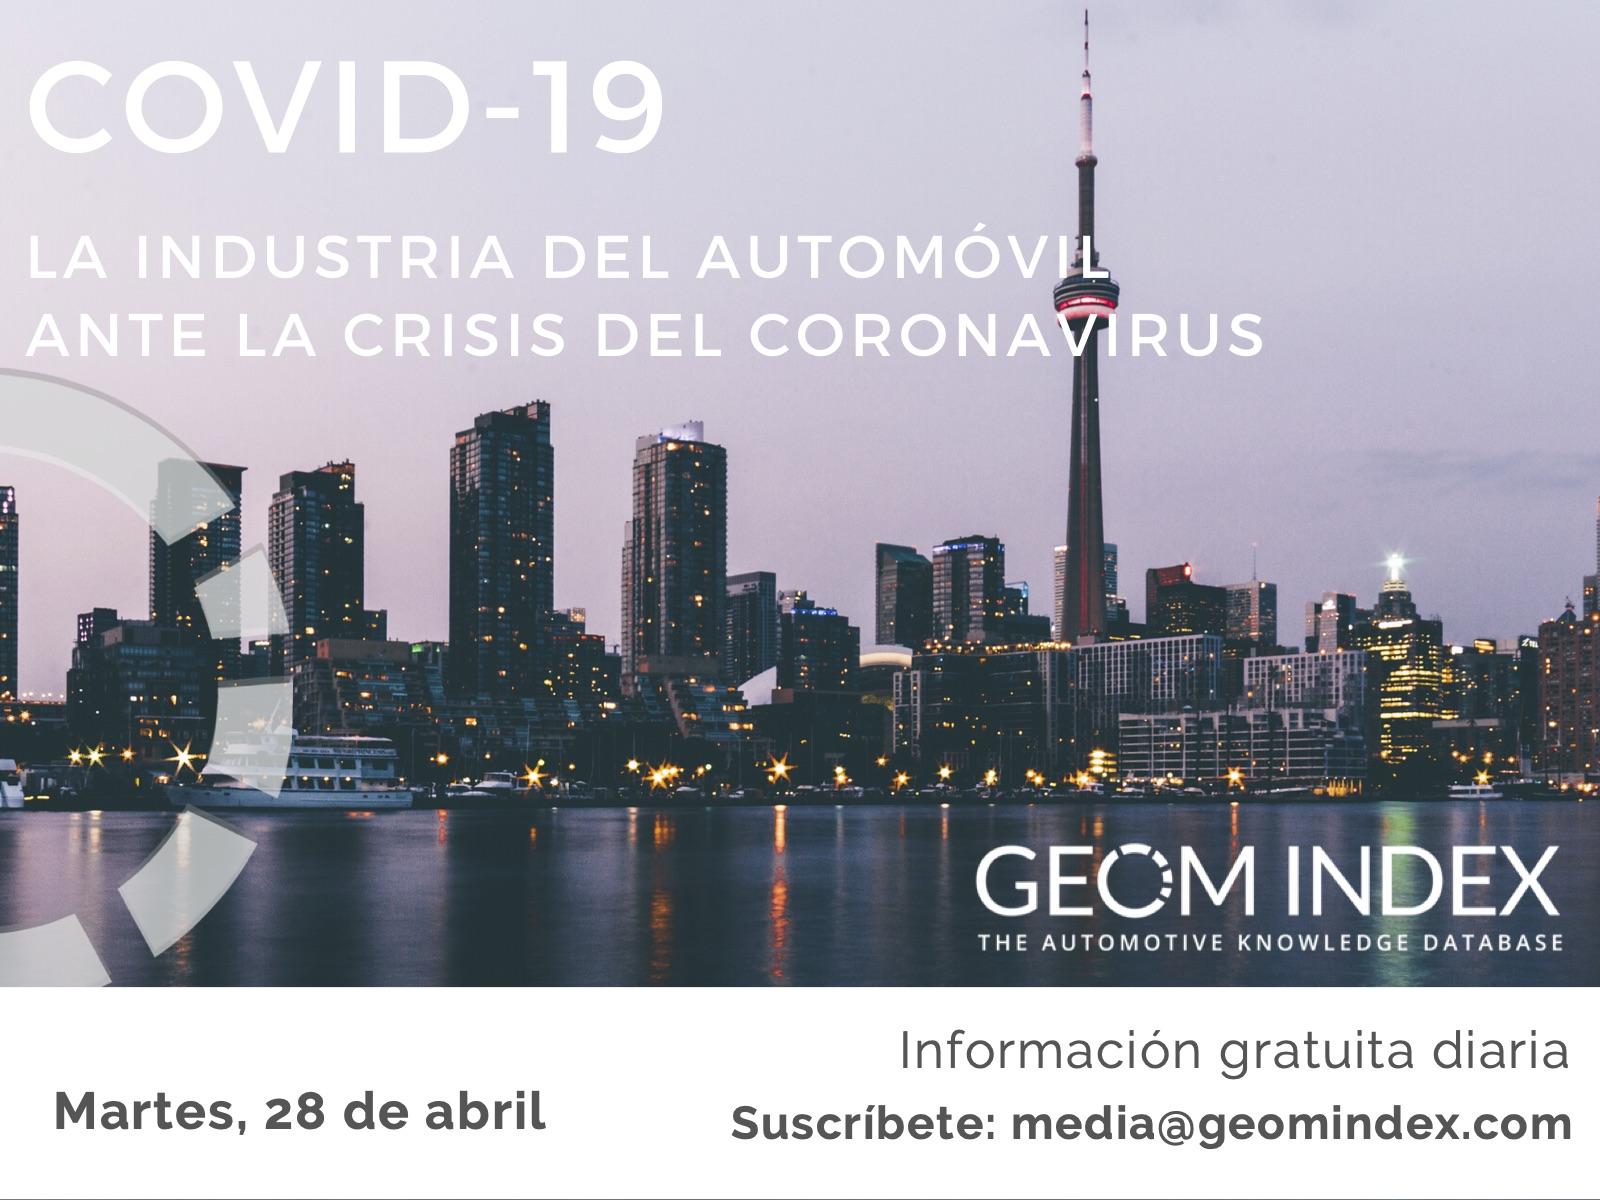 Informe 28 de abril – La industria del automóvil ante la crisis del Covid-19